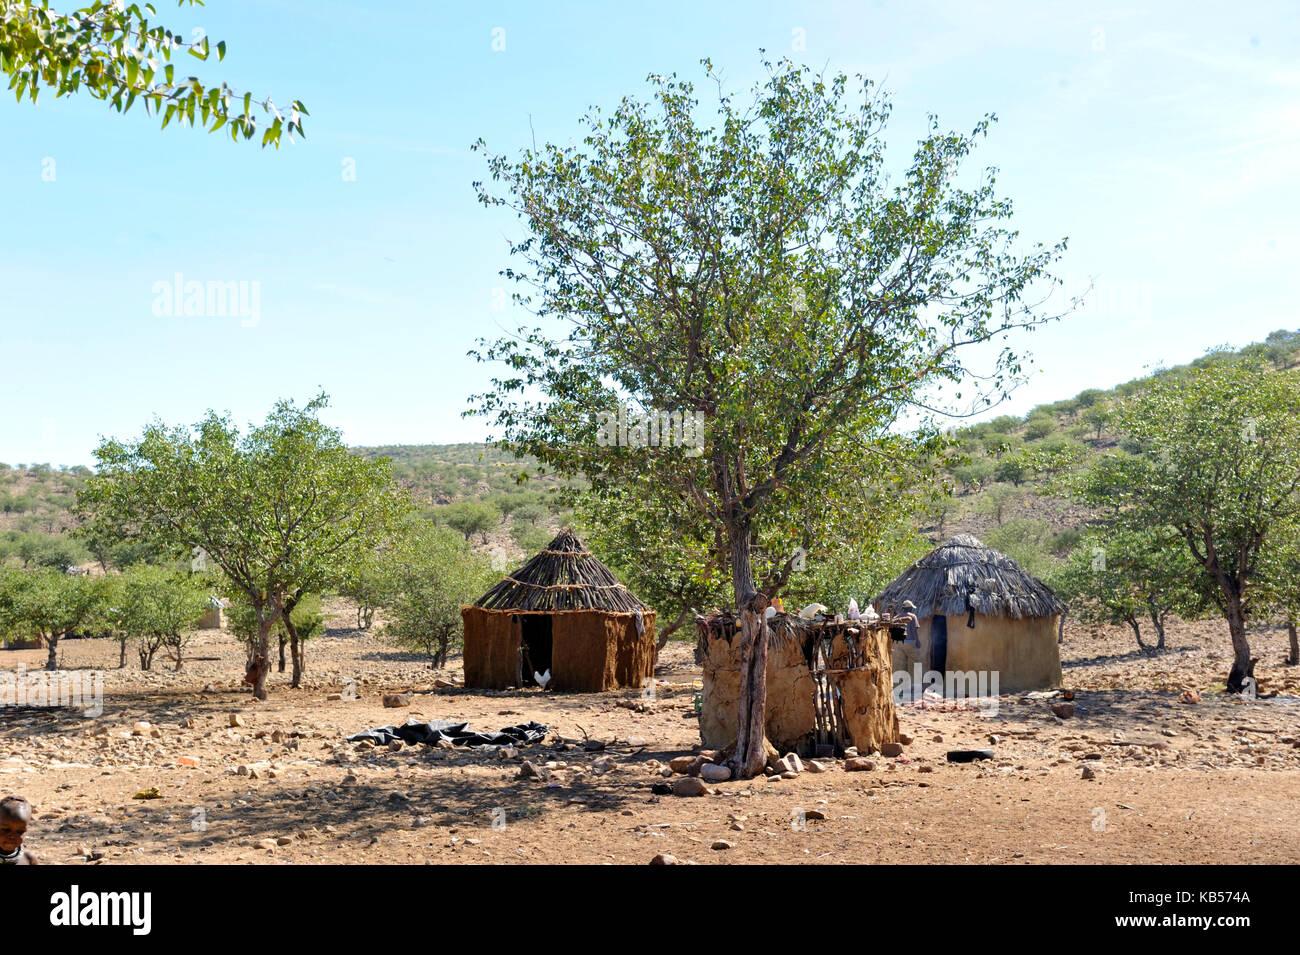 Namibia, Kaokoland or Kaokoveld, Himba village - Stock Image